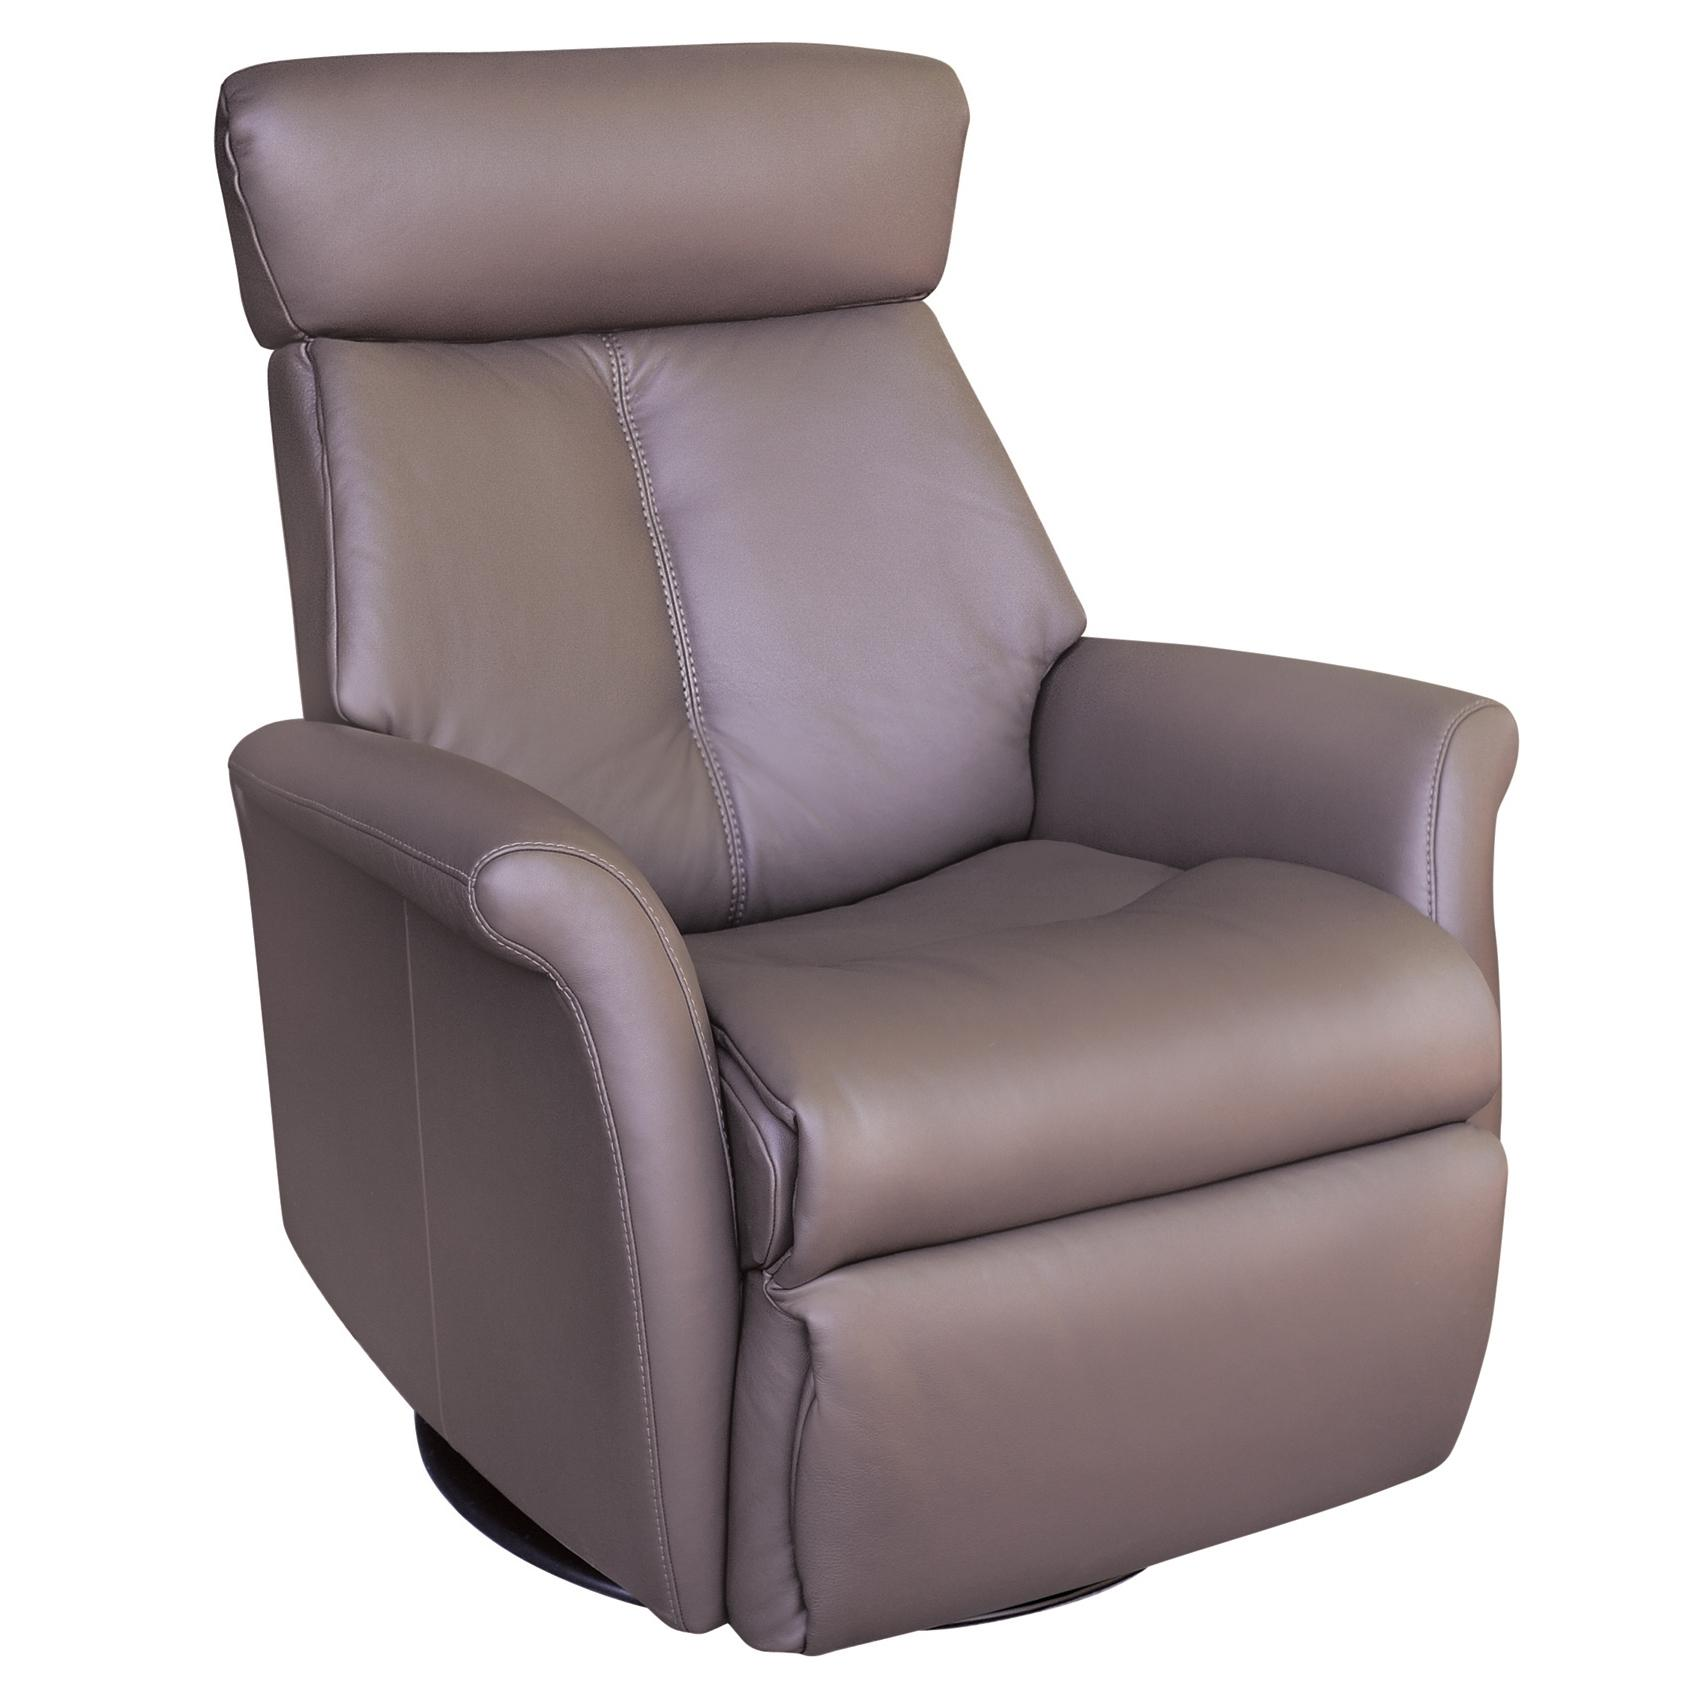 Vendor 508 Recliners Recliner Relaxer - Item Number: 0154264SO